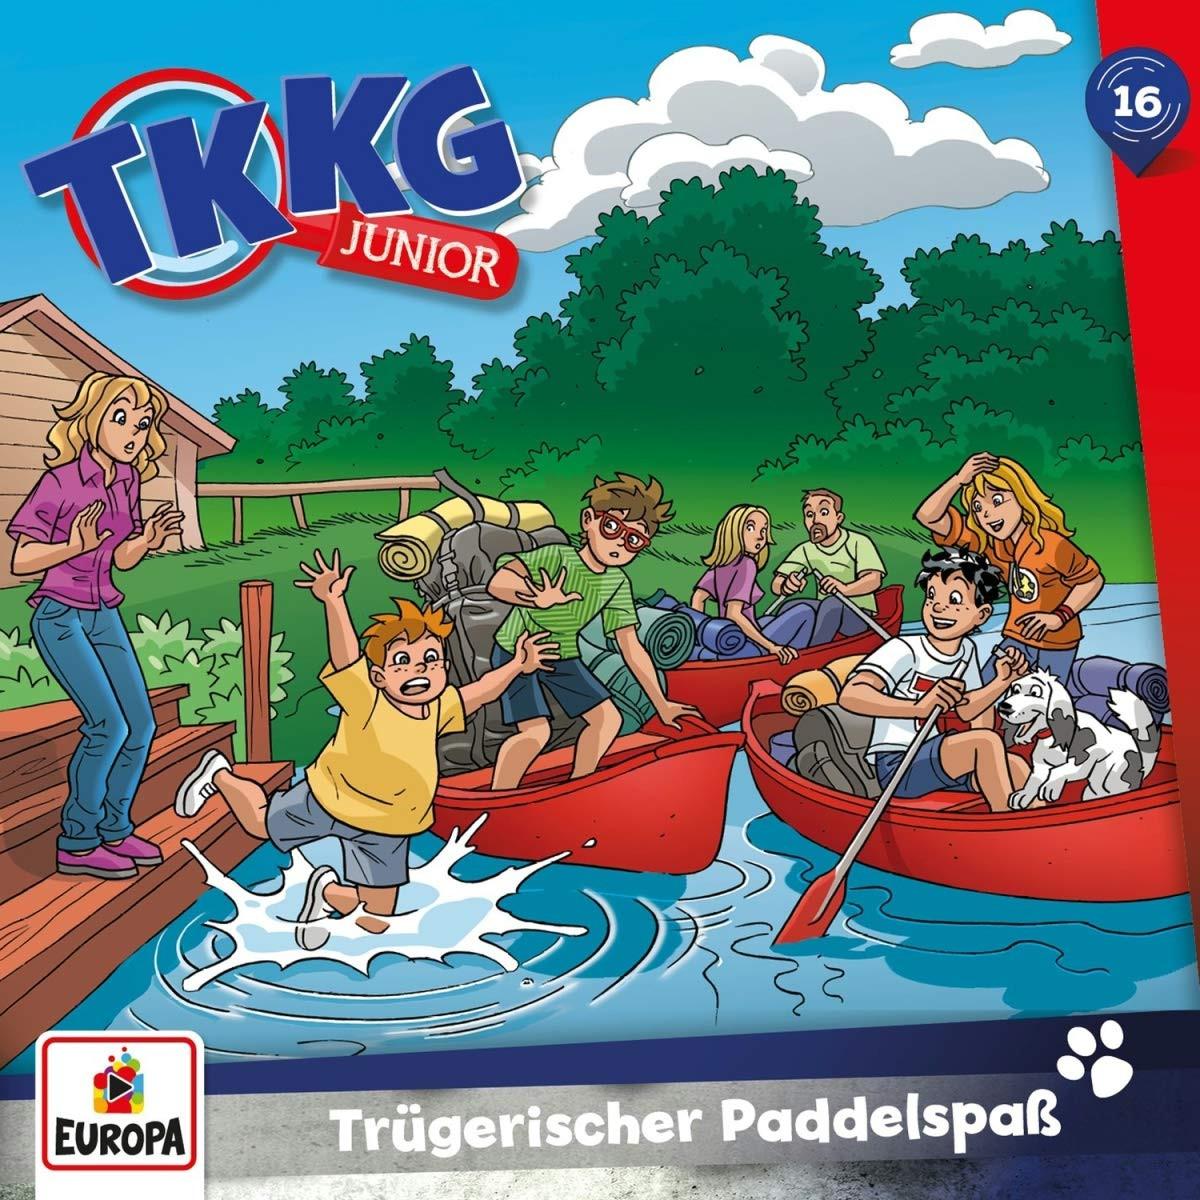 TKKG Junior - Folge 16: Trügerischer Paddelspaß